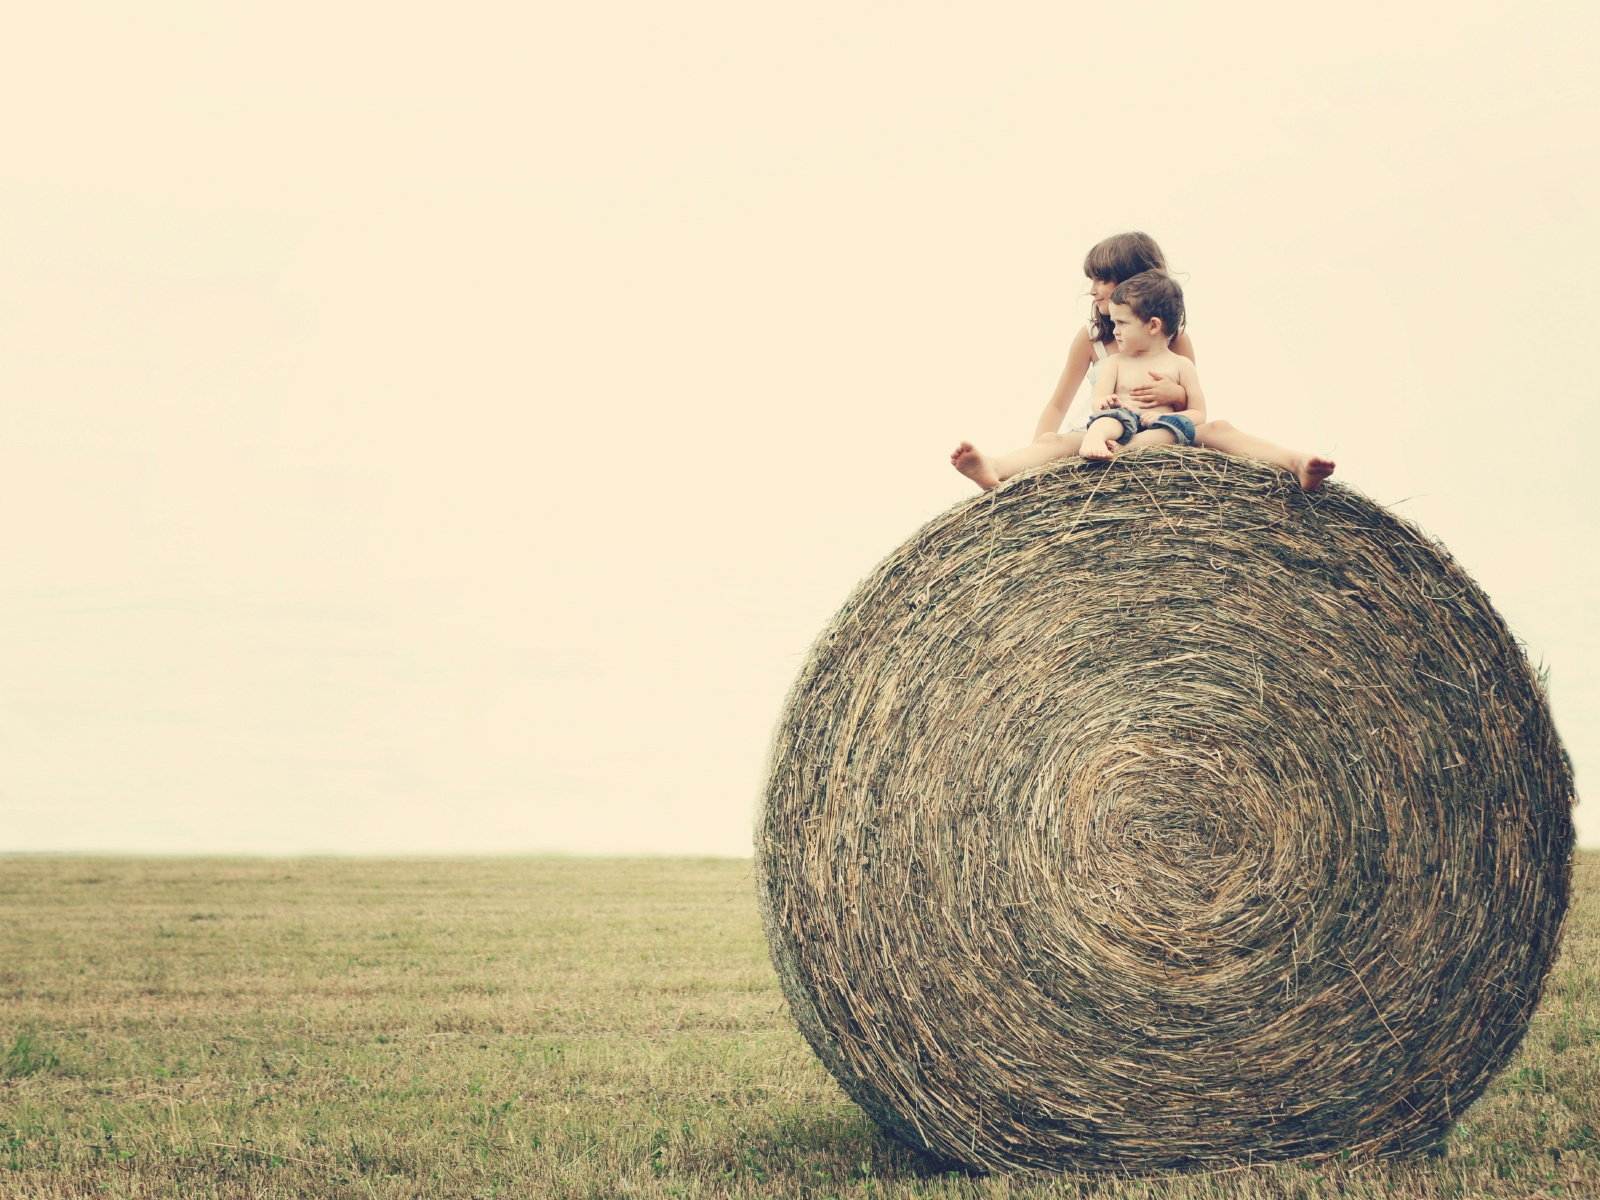 Country_Life_Kids_on_Haybale.jpg